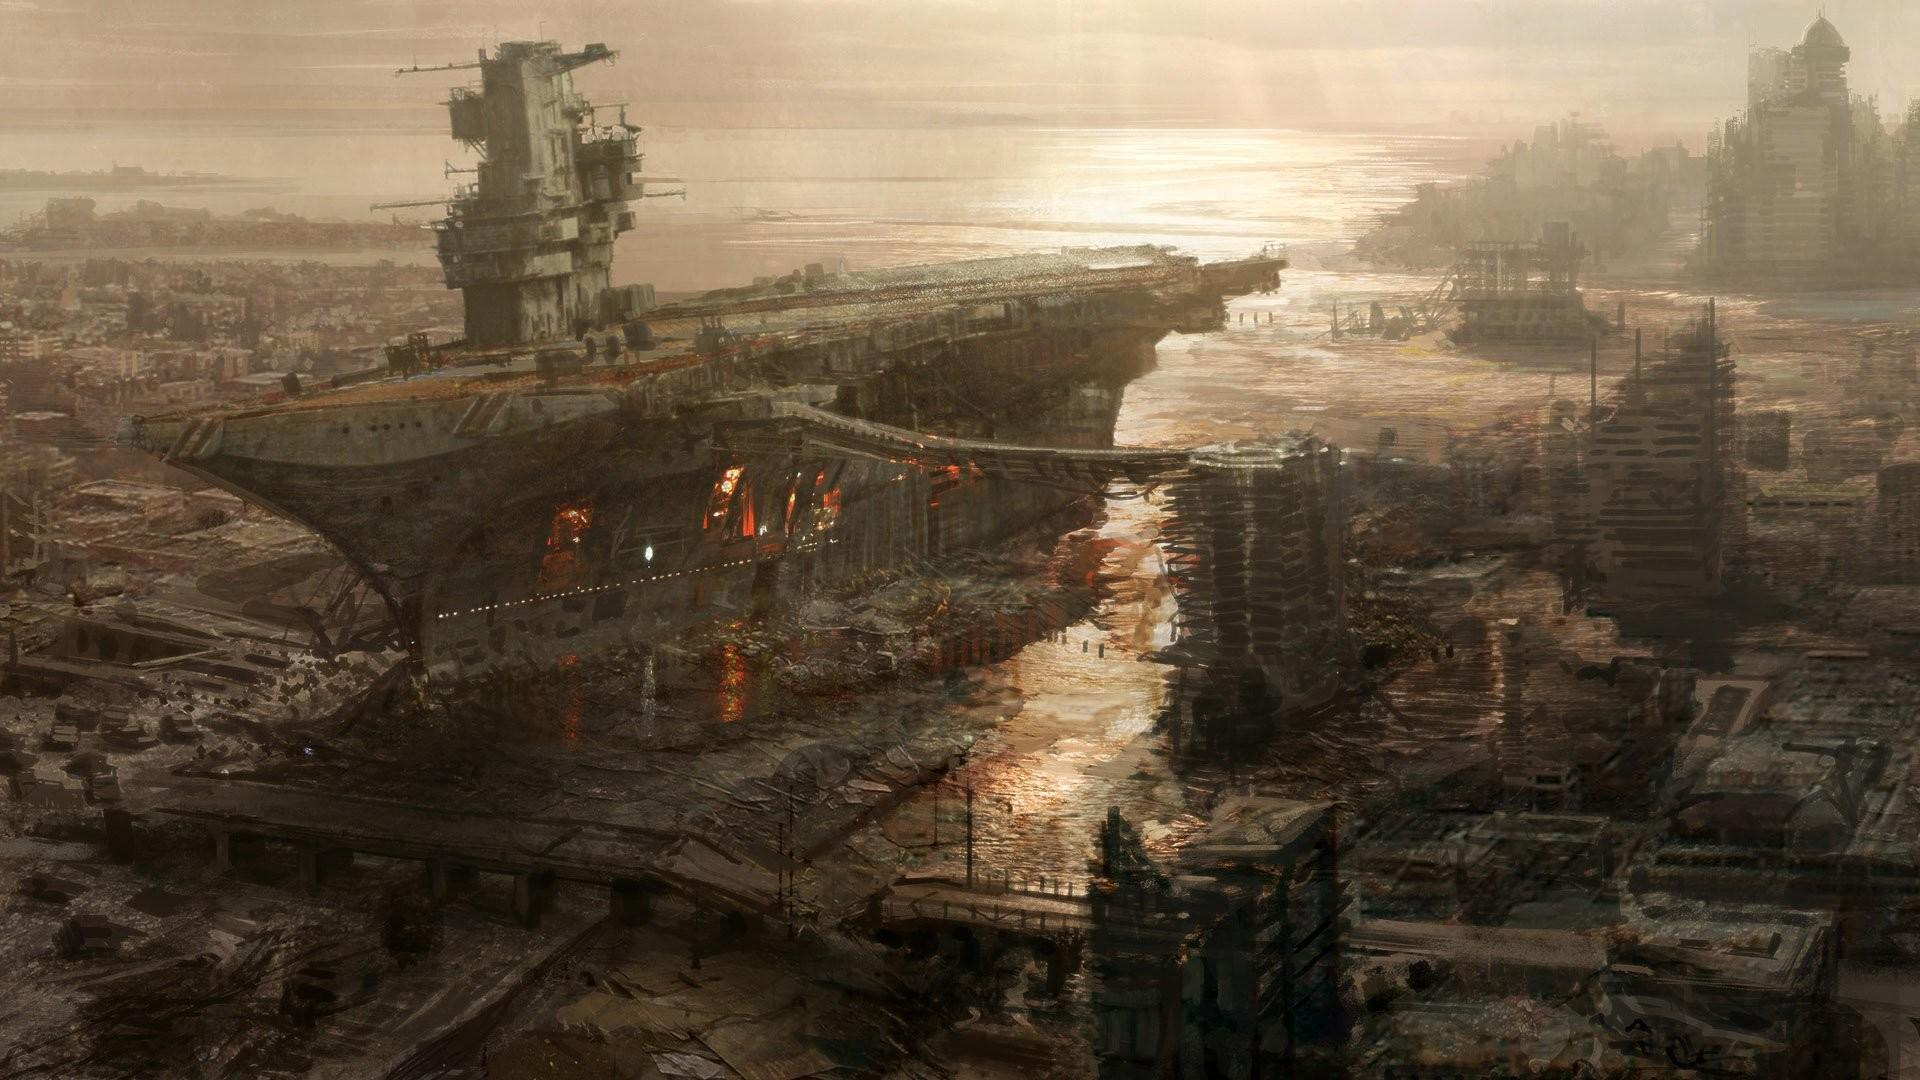 Video Game Fallout 3 Itachi Cthulhu Rivet City City Apocalypse Ship Star  Wars Fallout Sci Fi